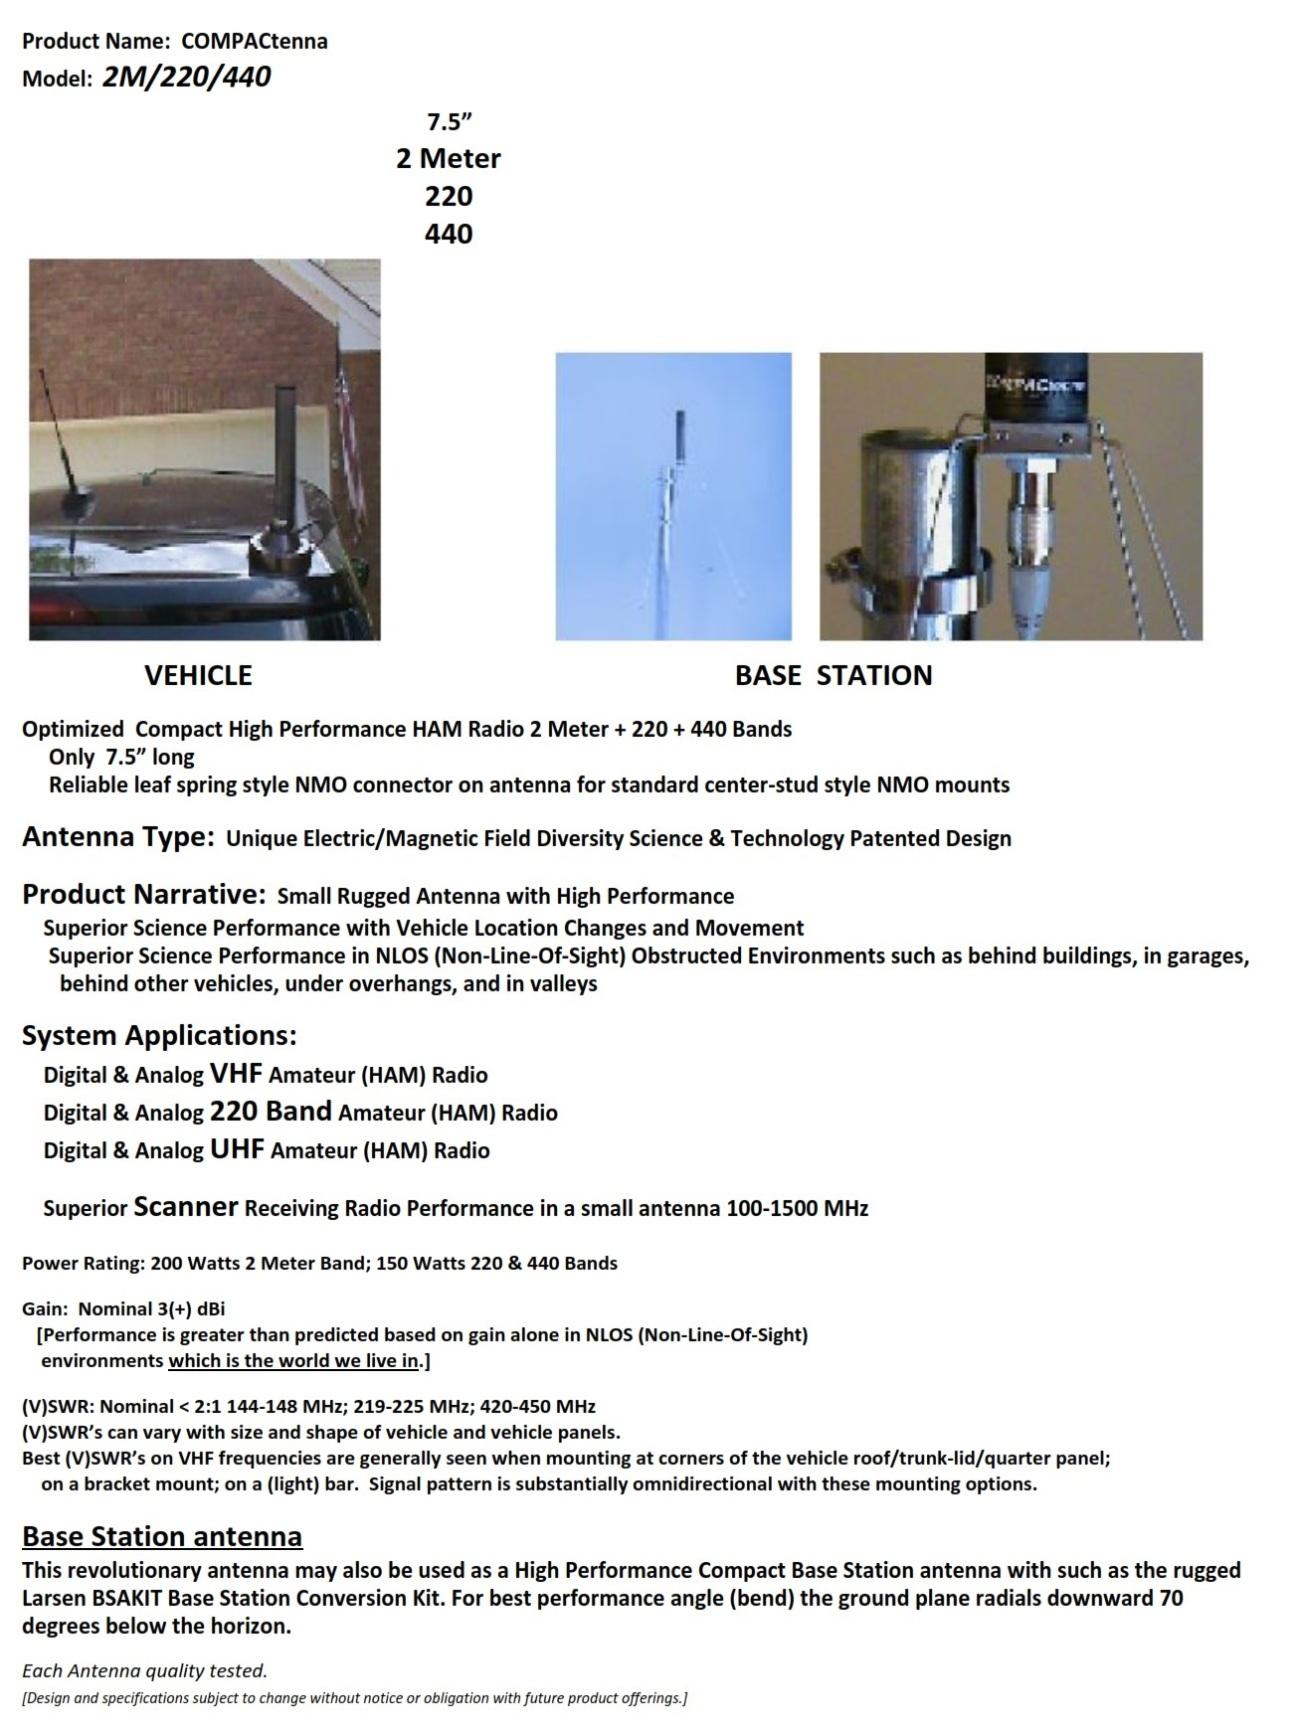 compactenna-data-sheet-2m-220-440-5-2-2017 Faszinierend 5 2 In Meter Dekorationen